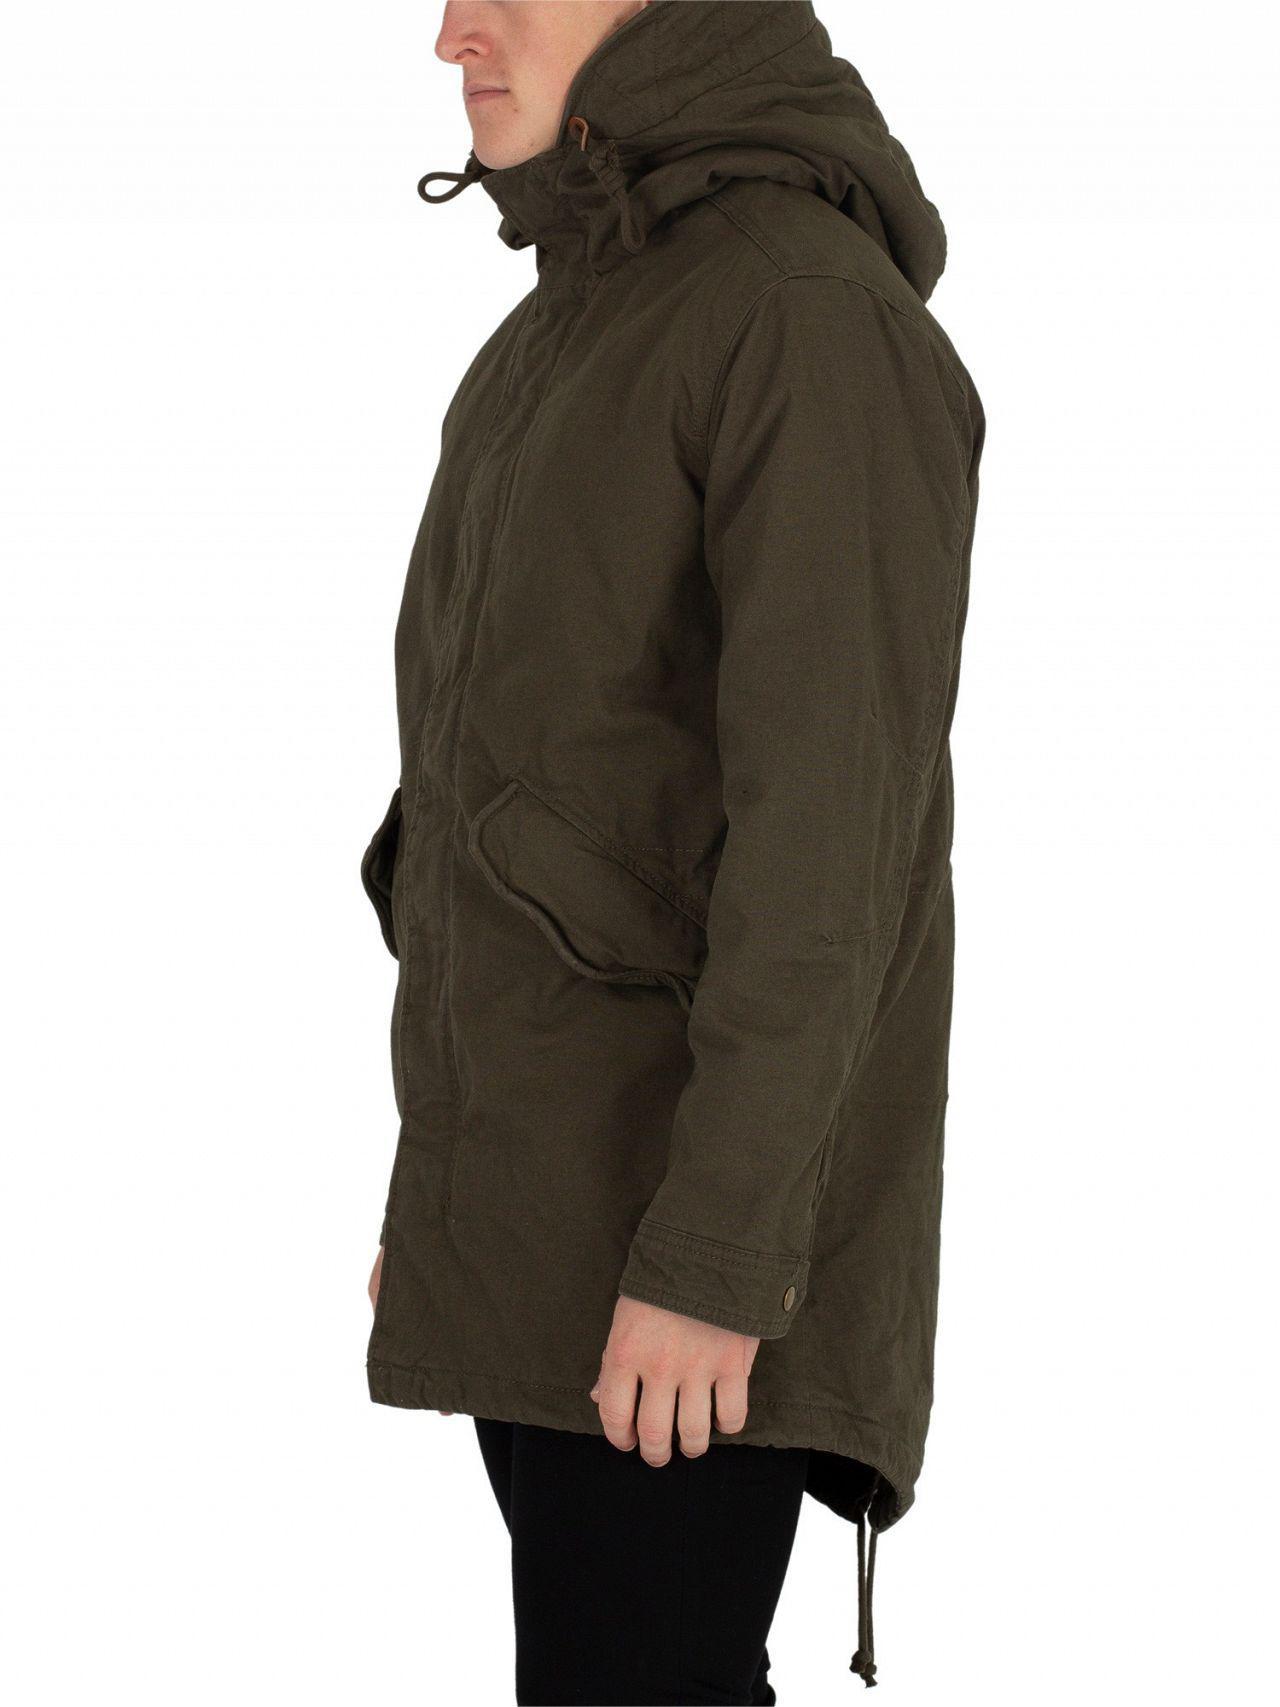 952e897d7 Jack & Jones Forest Night New Bento Parka Jacket in Green for Men - Lyst